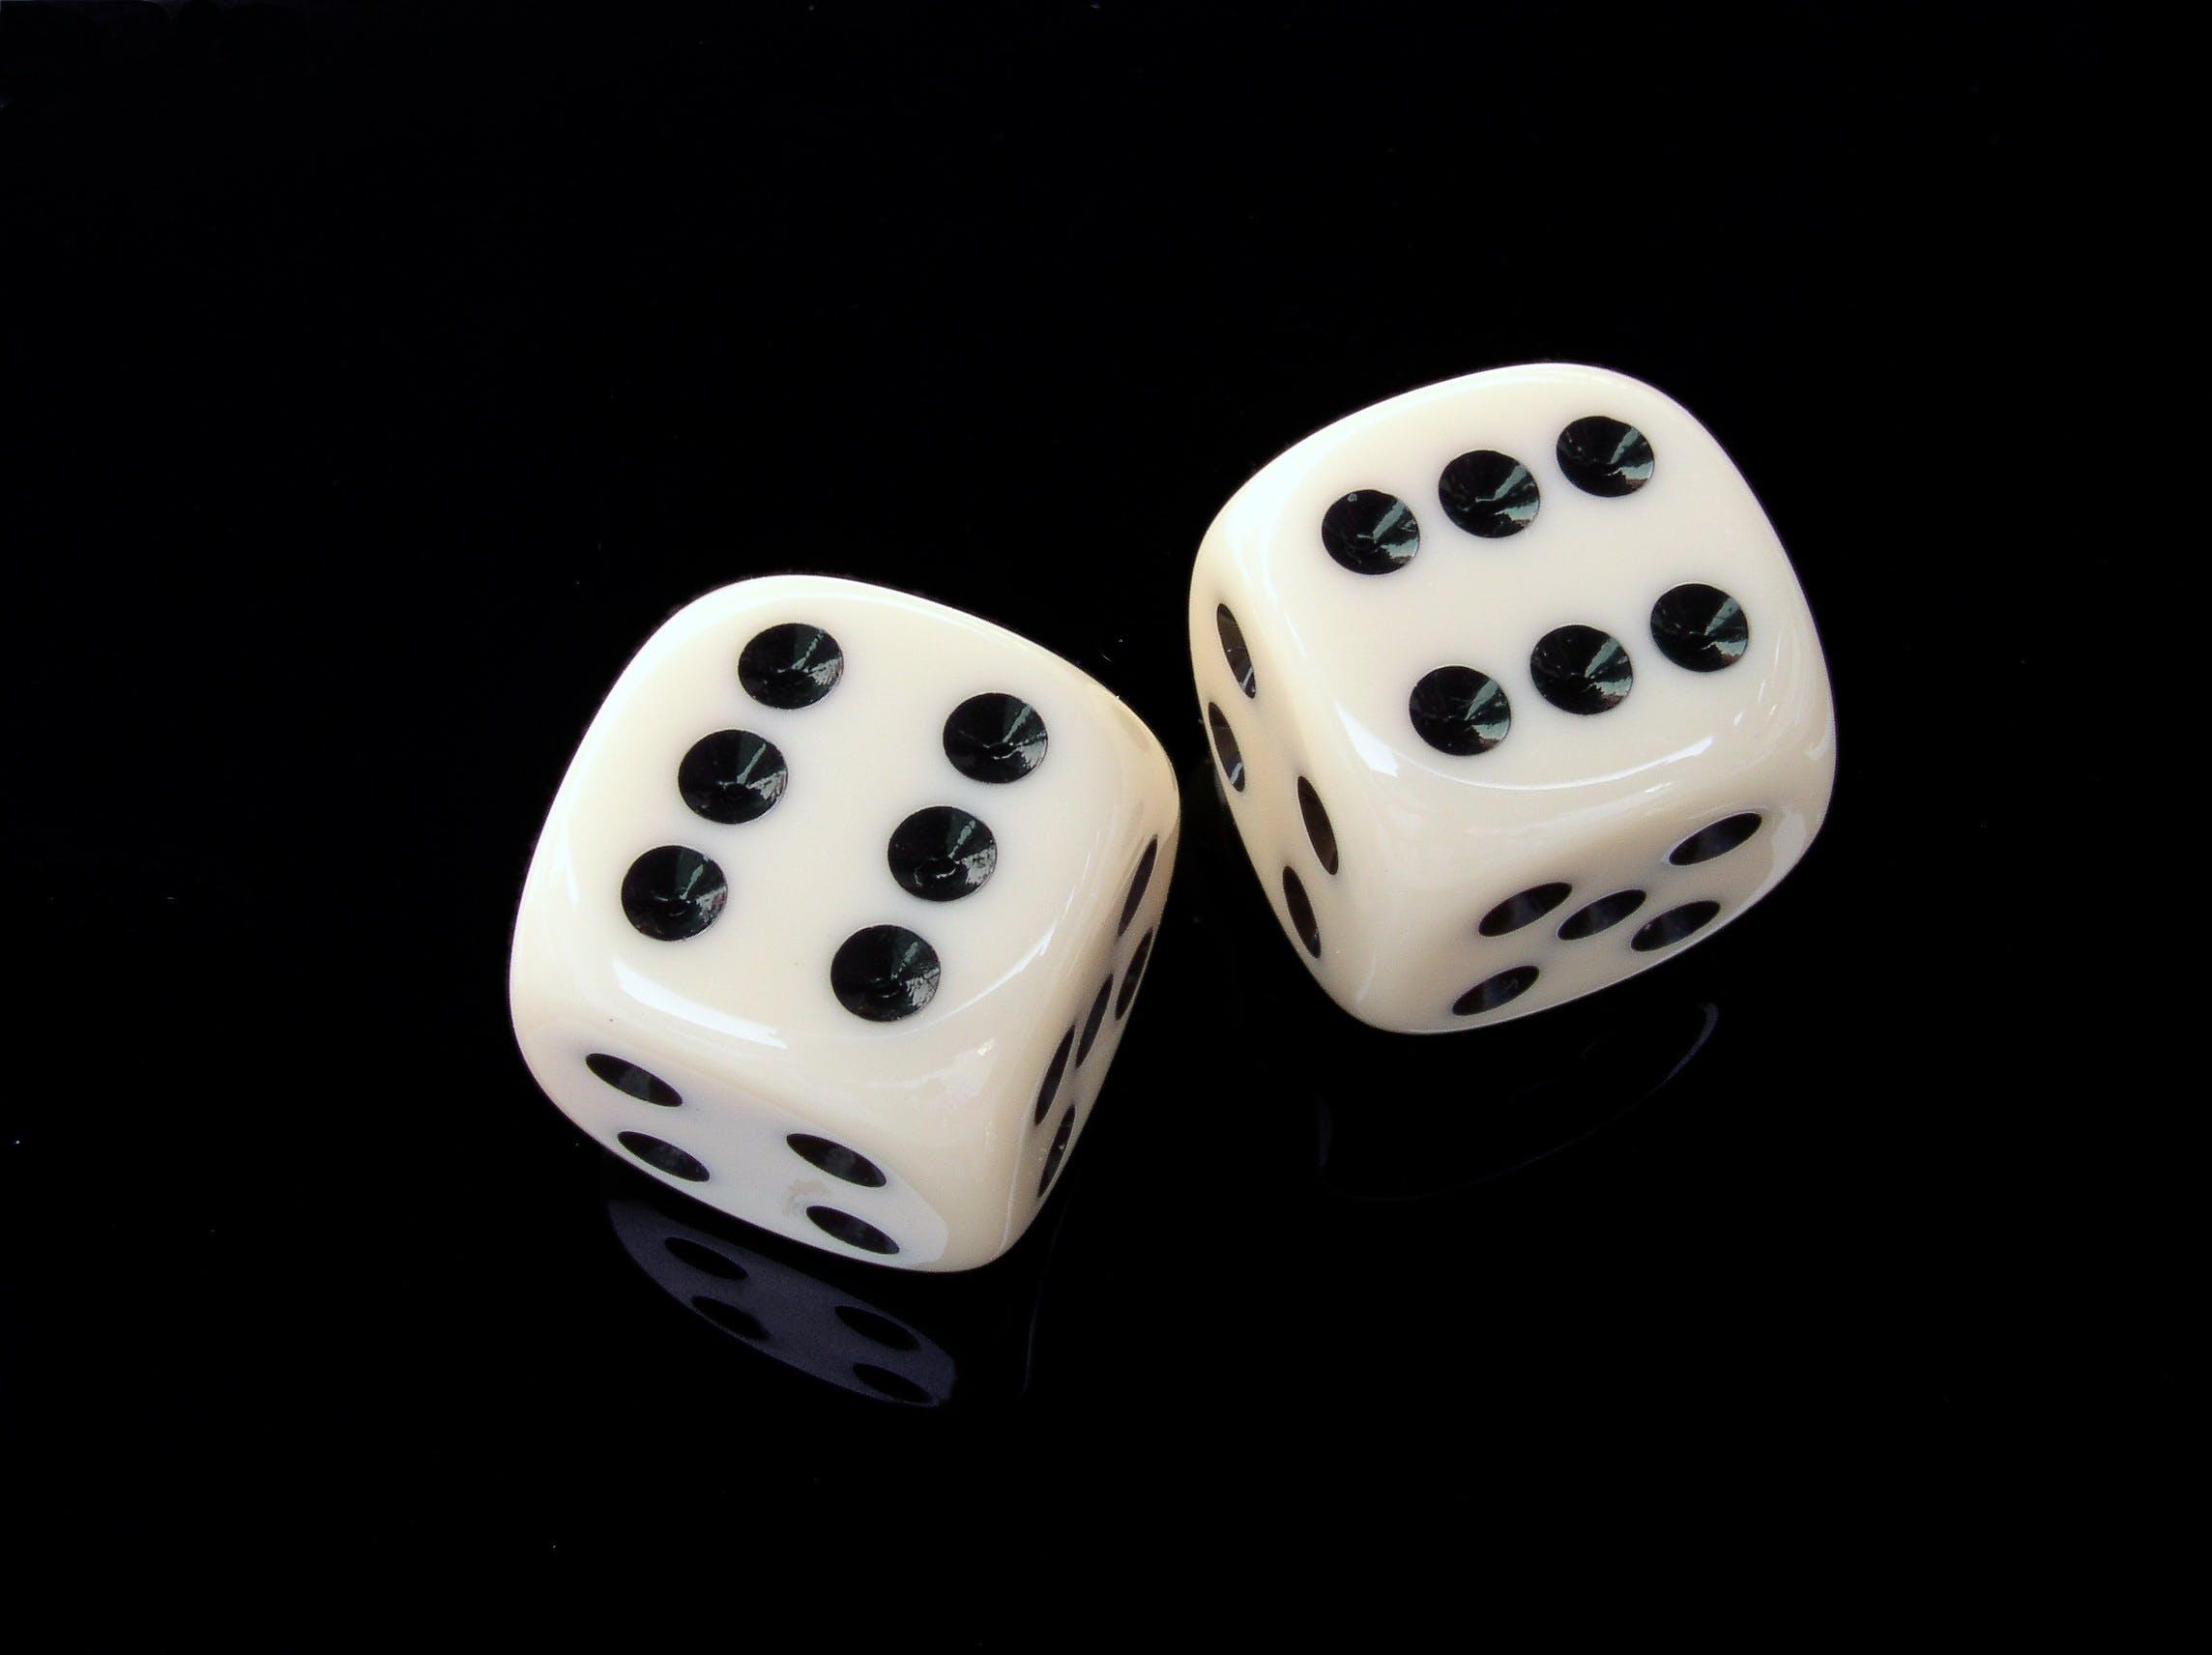 apostar, blanc i negre, cub